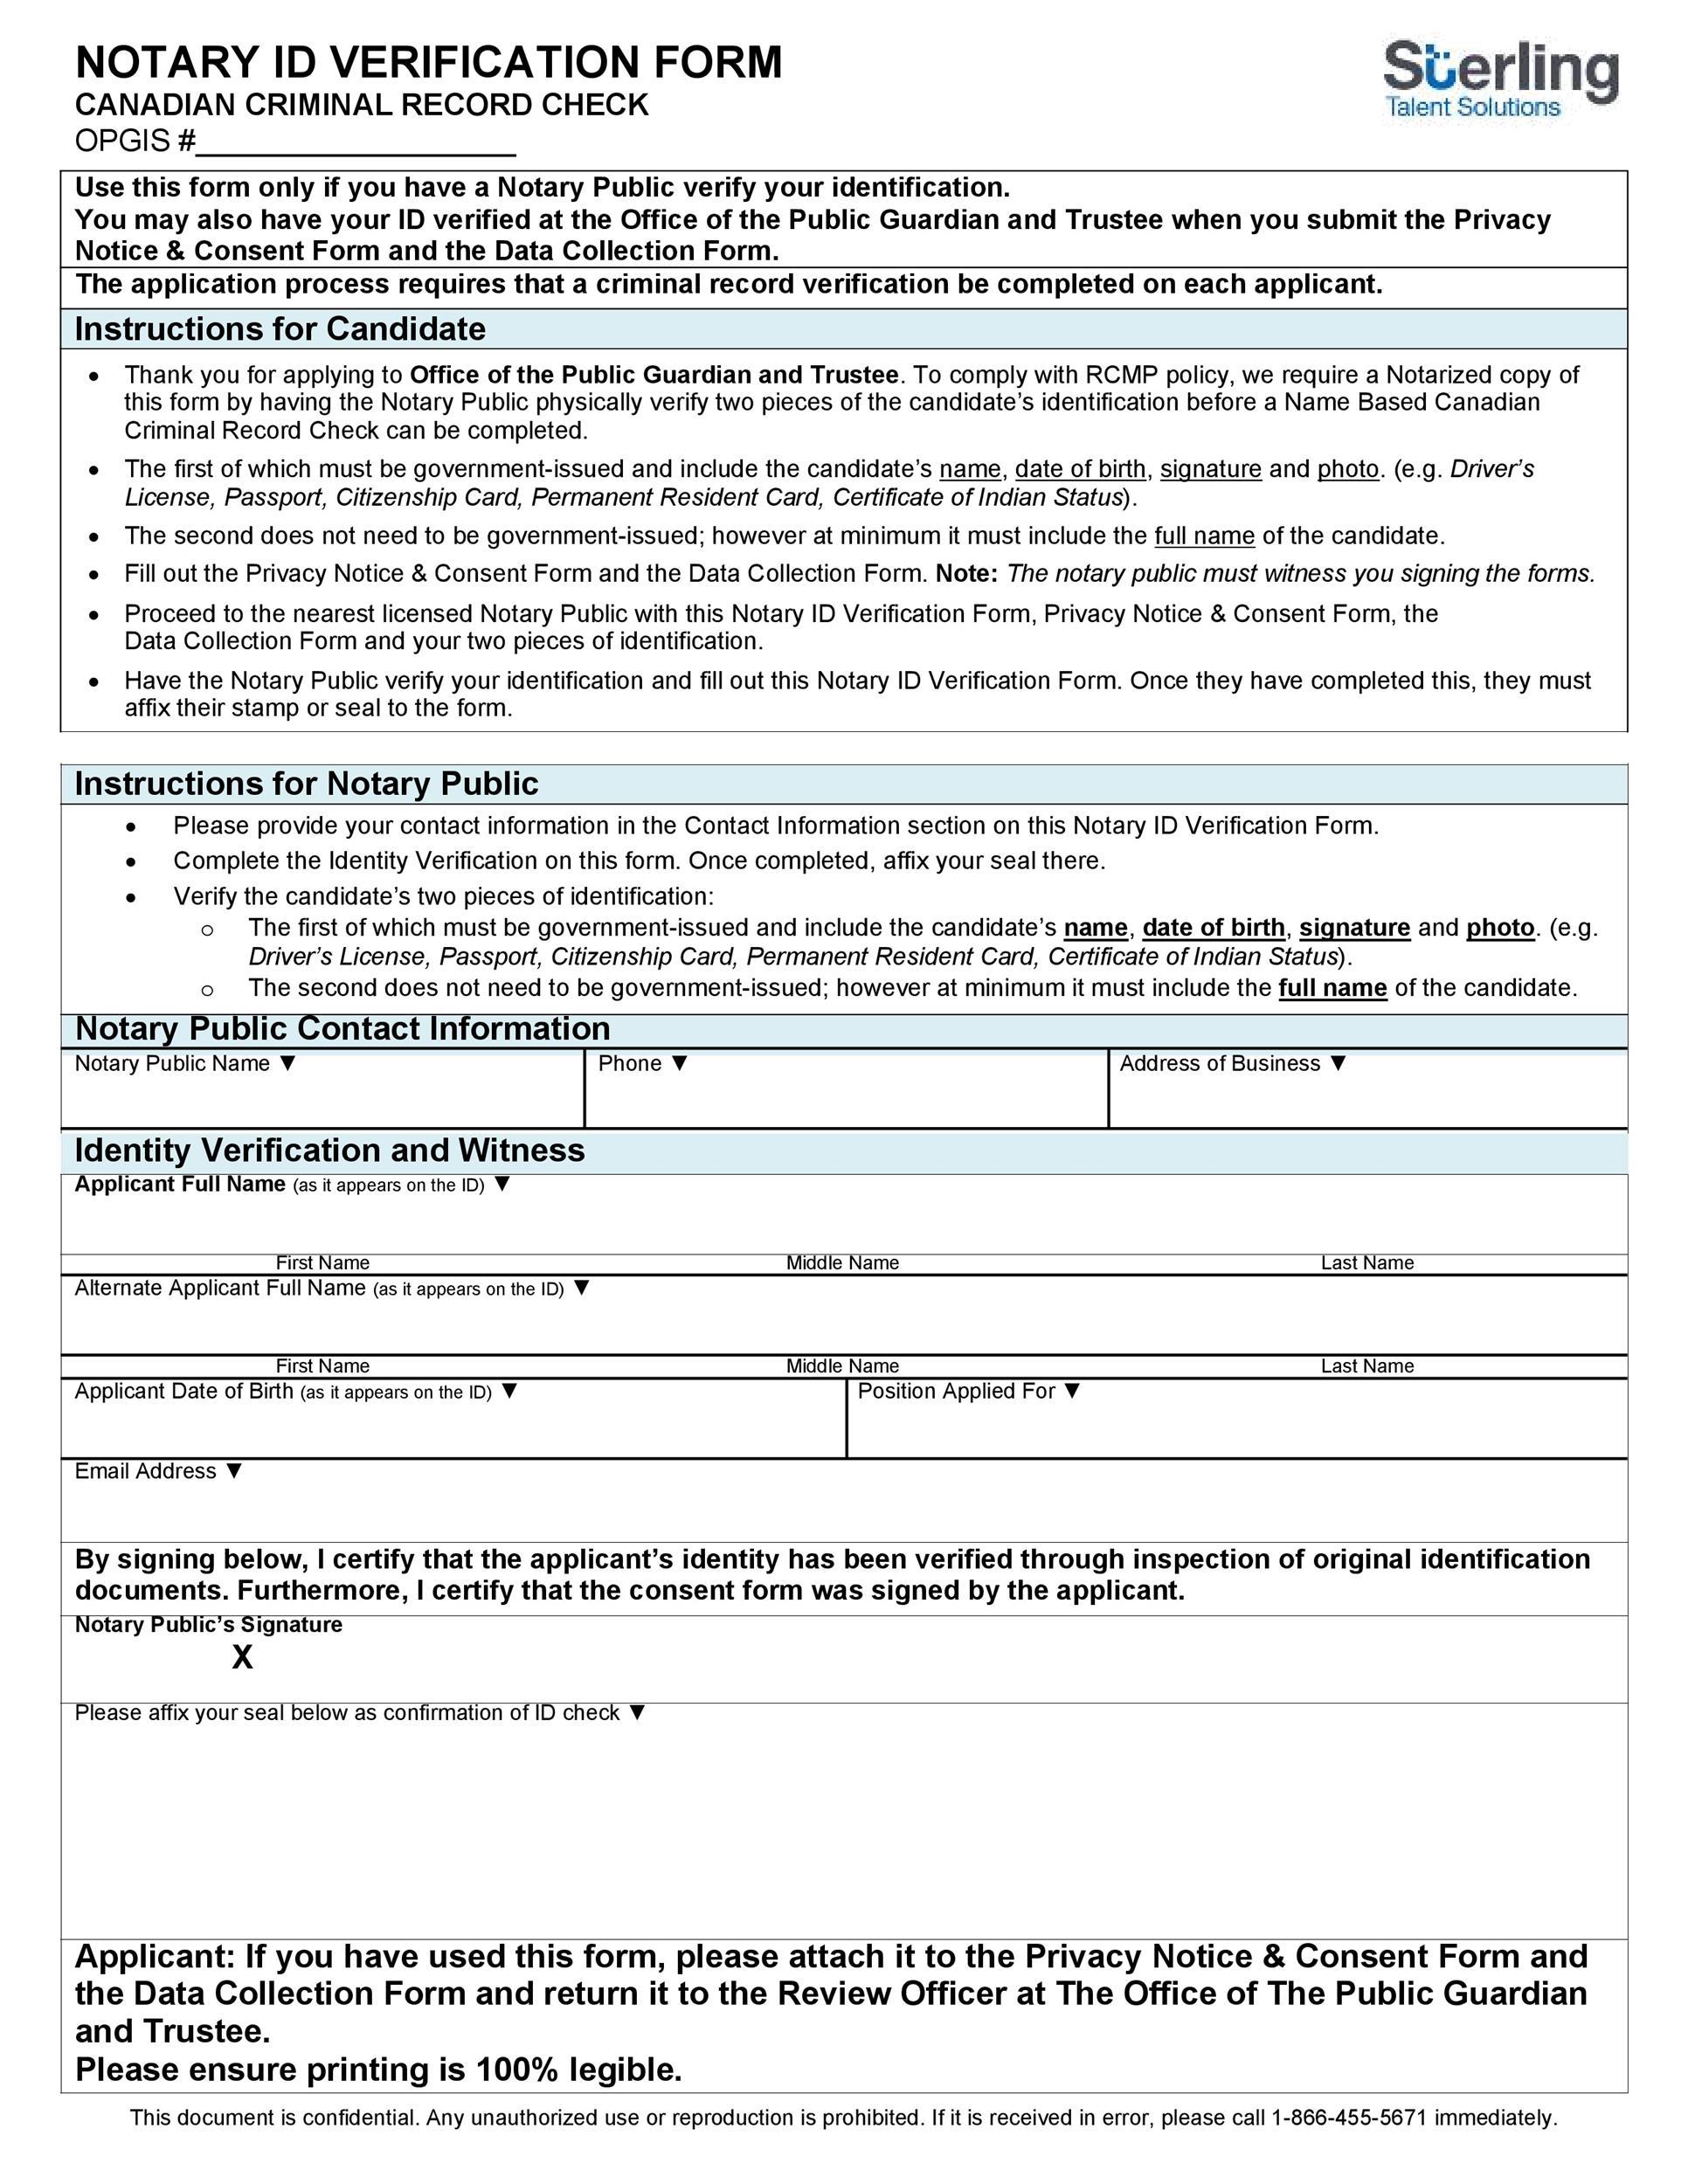 48 Free Affidavit of Identity Forms (MS Word) ᐅ Template Lab